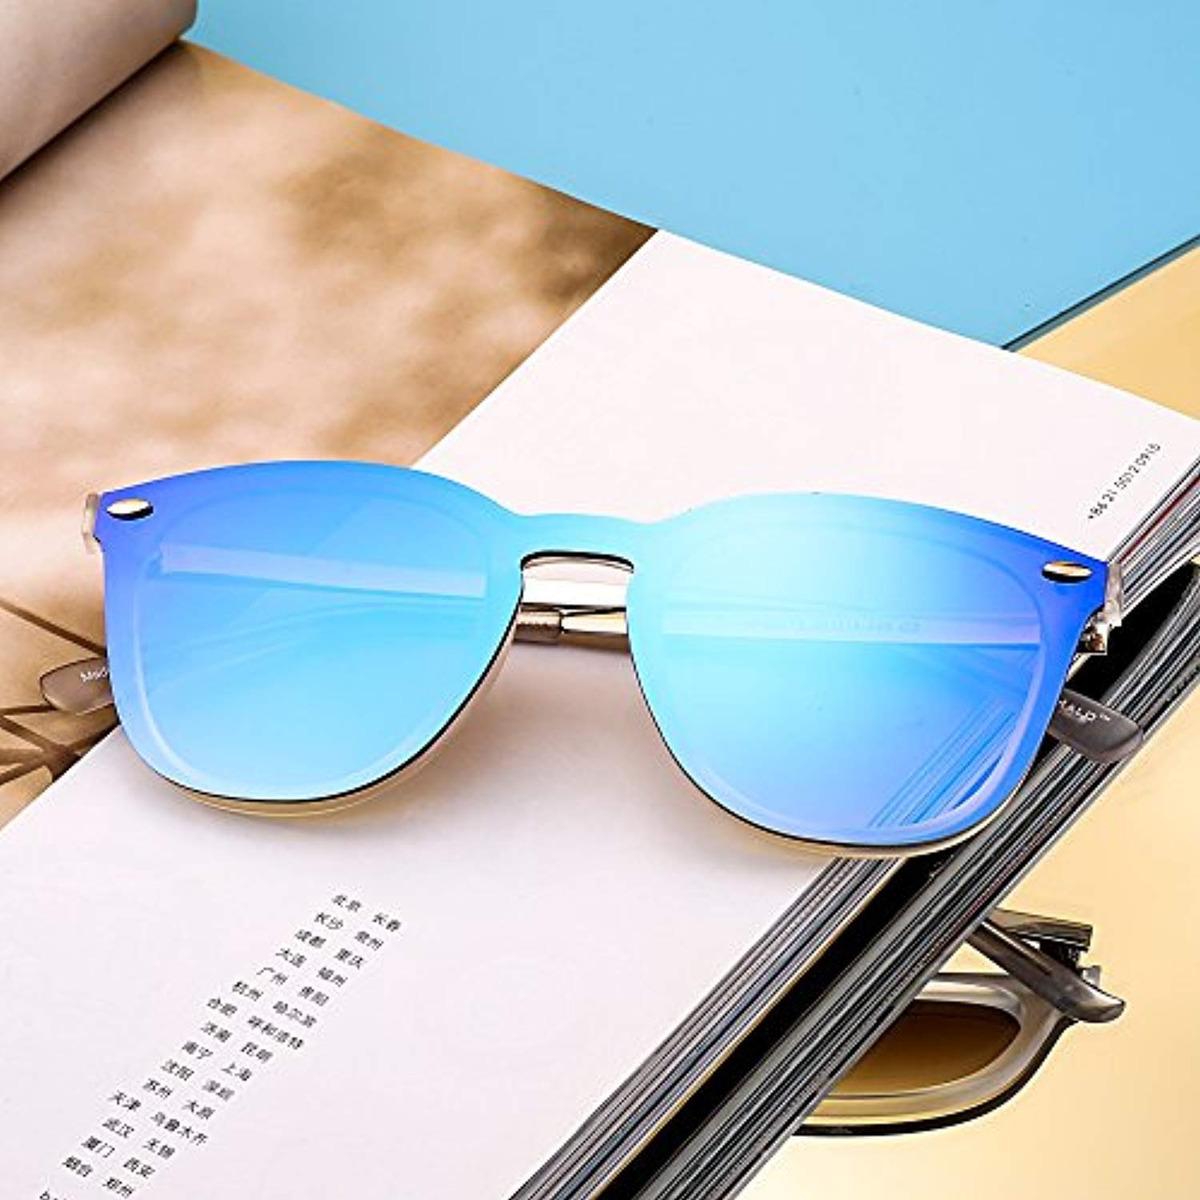 5920d7b21b Gafas De Sol Sin Montura Wayfarer Espejo - $ 125.533 en Mercado Libre